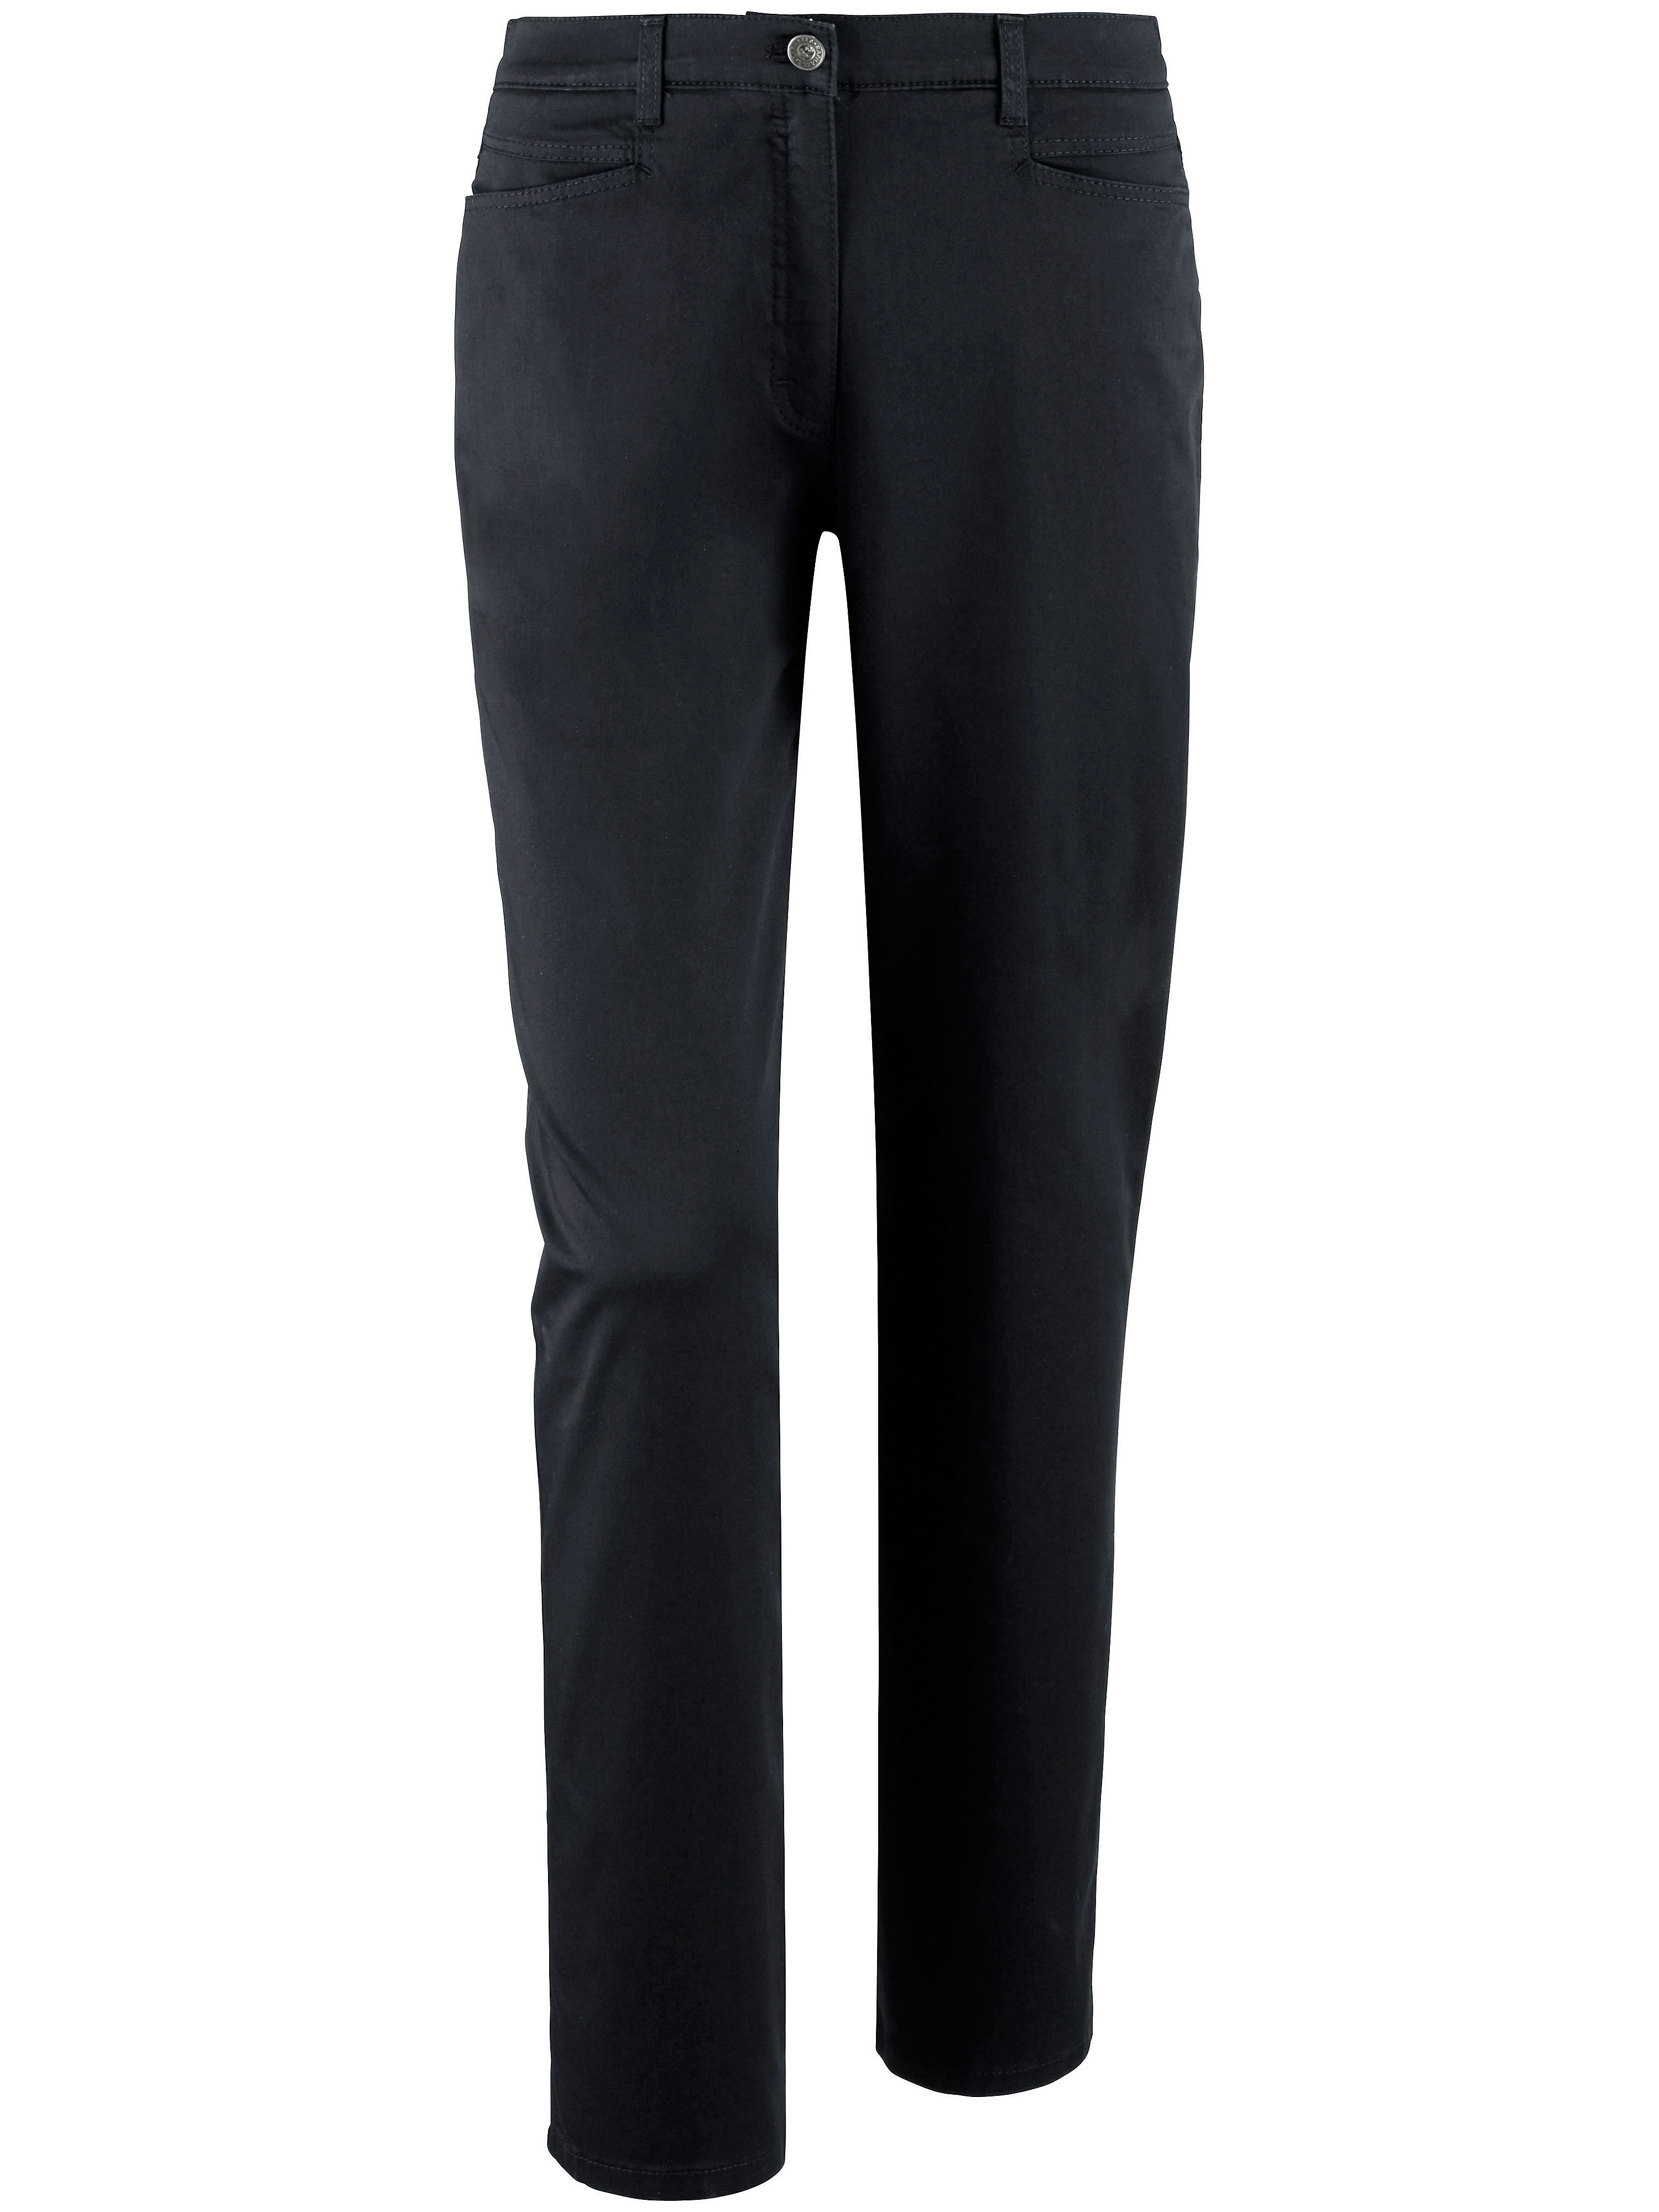 'Comfort Plus-jeans, model Cordula Van Raphaela by Brax blauw